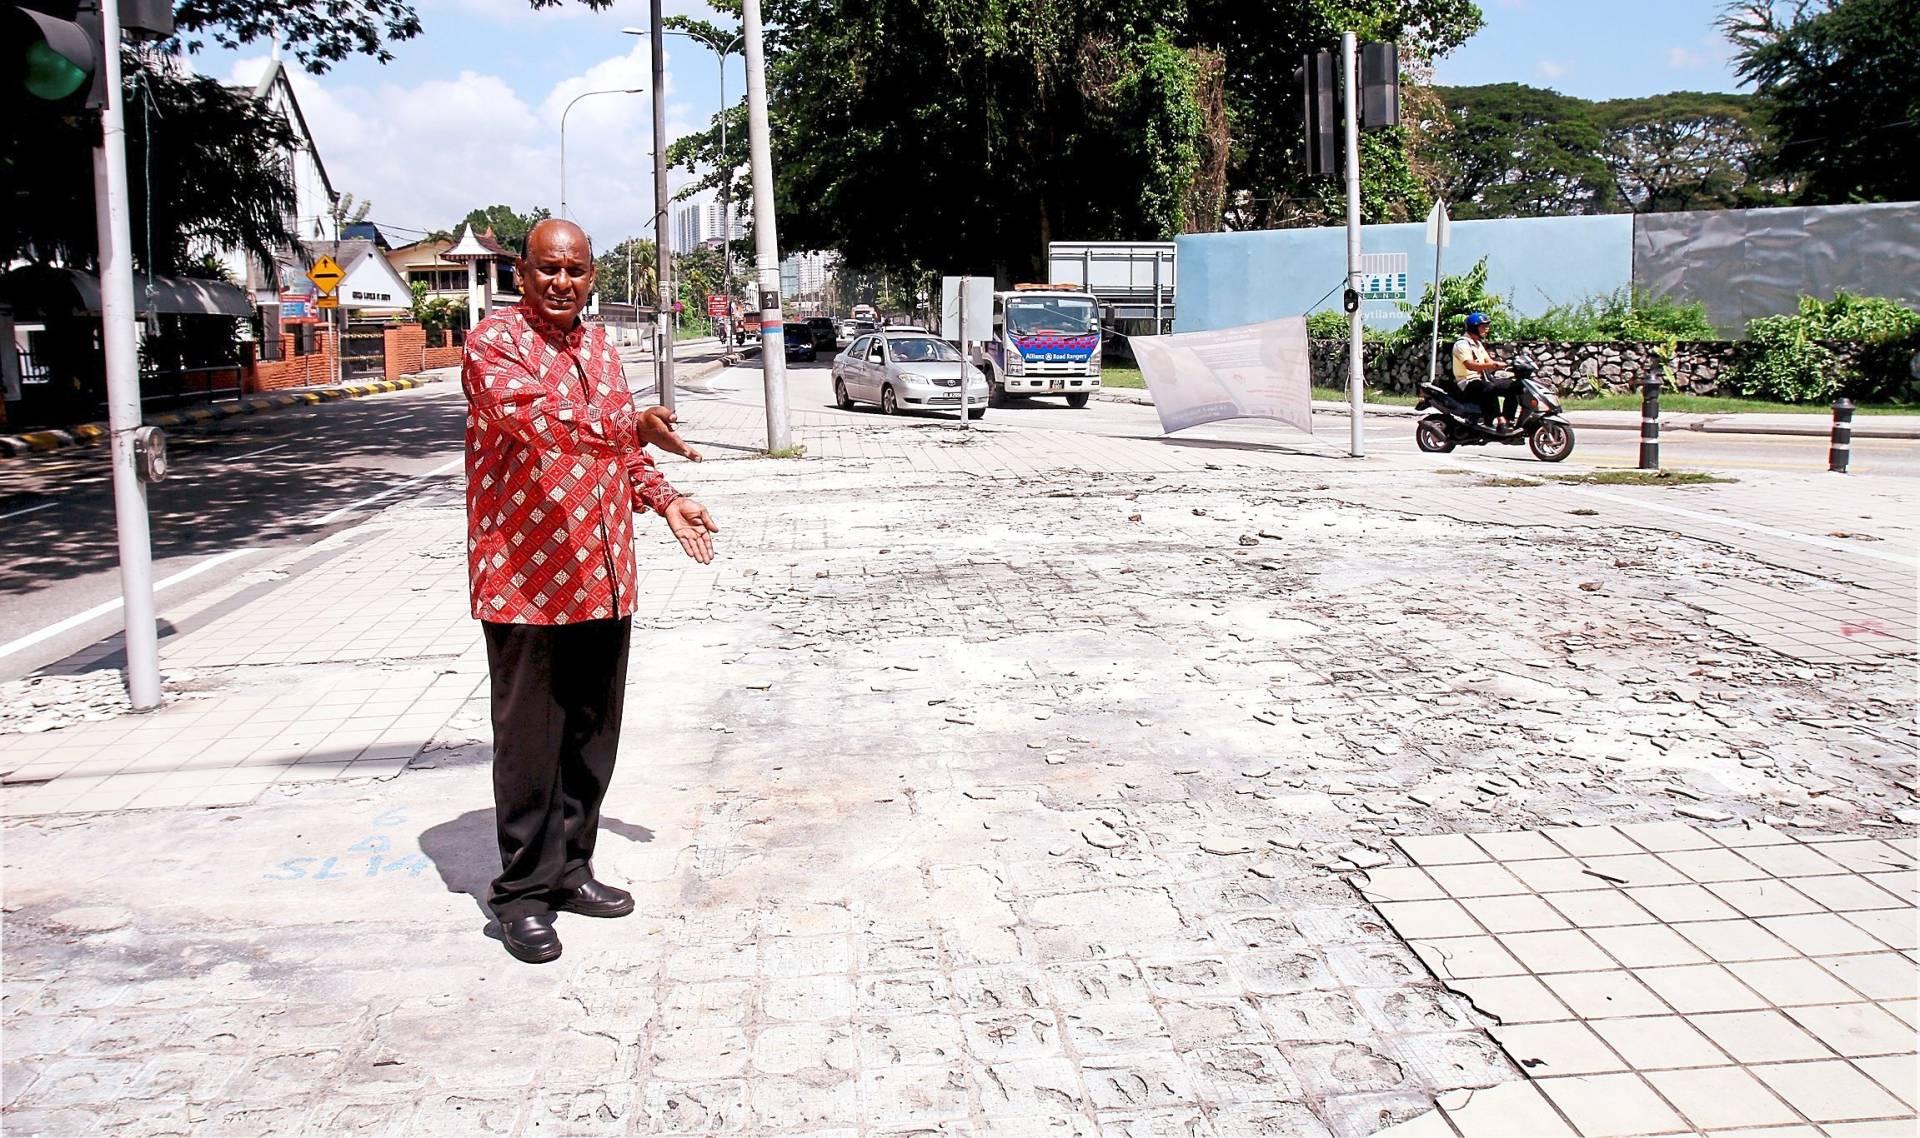 Panjamorthy suggests a tidal-flow system for Jalan Sentul traffic through minimal modification to the divider at the Jalan Sentul-Jalan Amra junction.